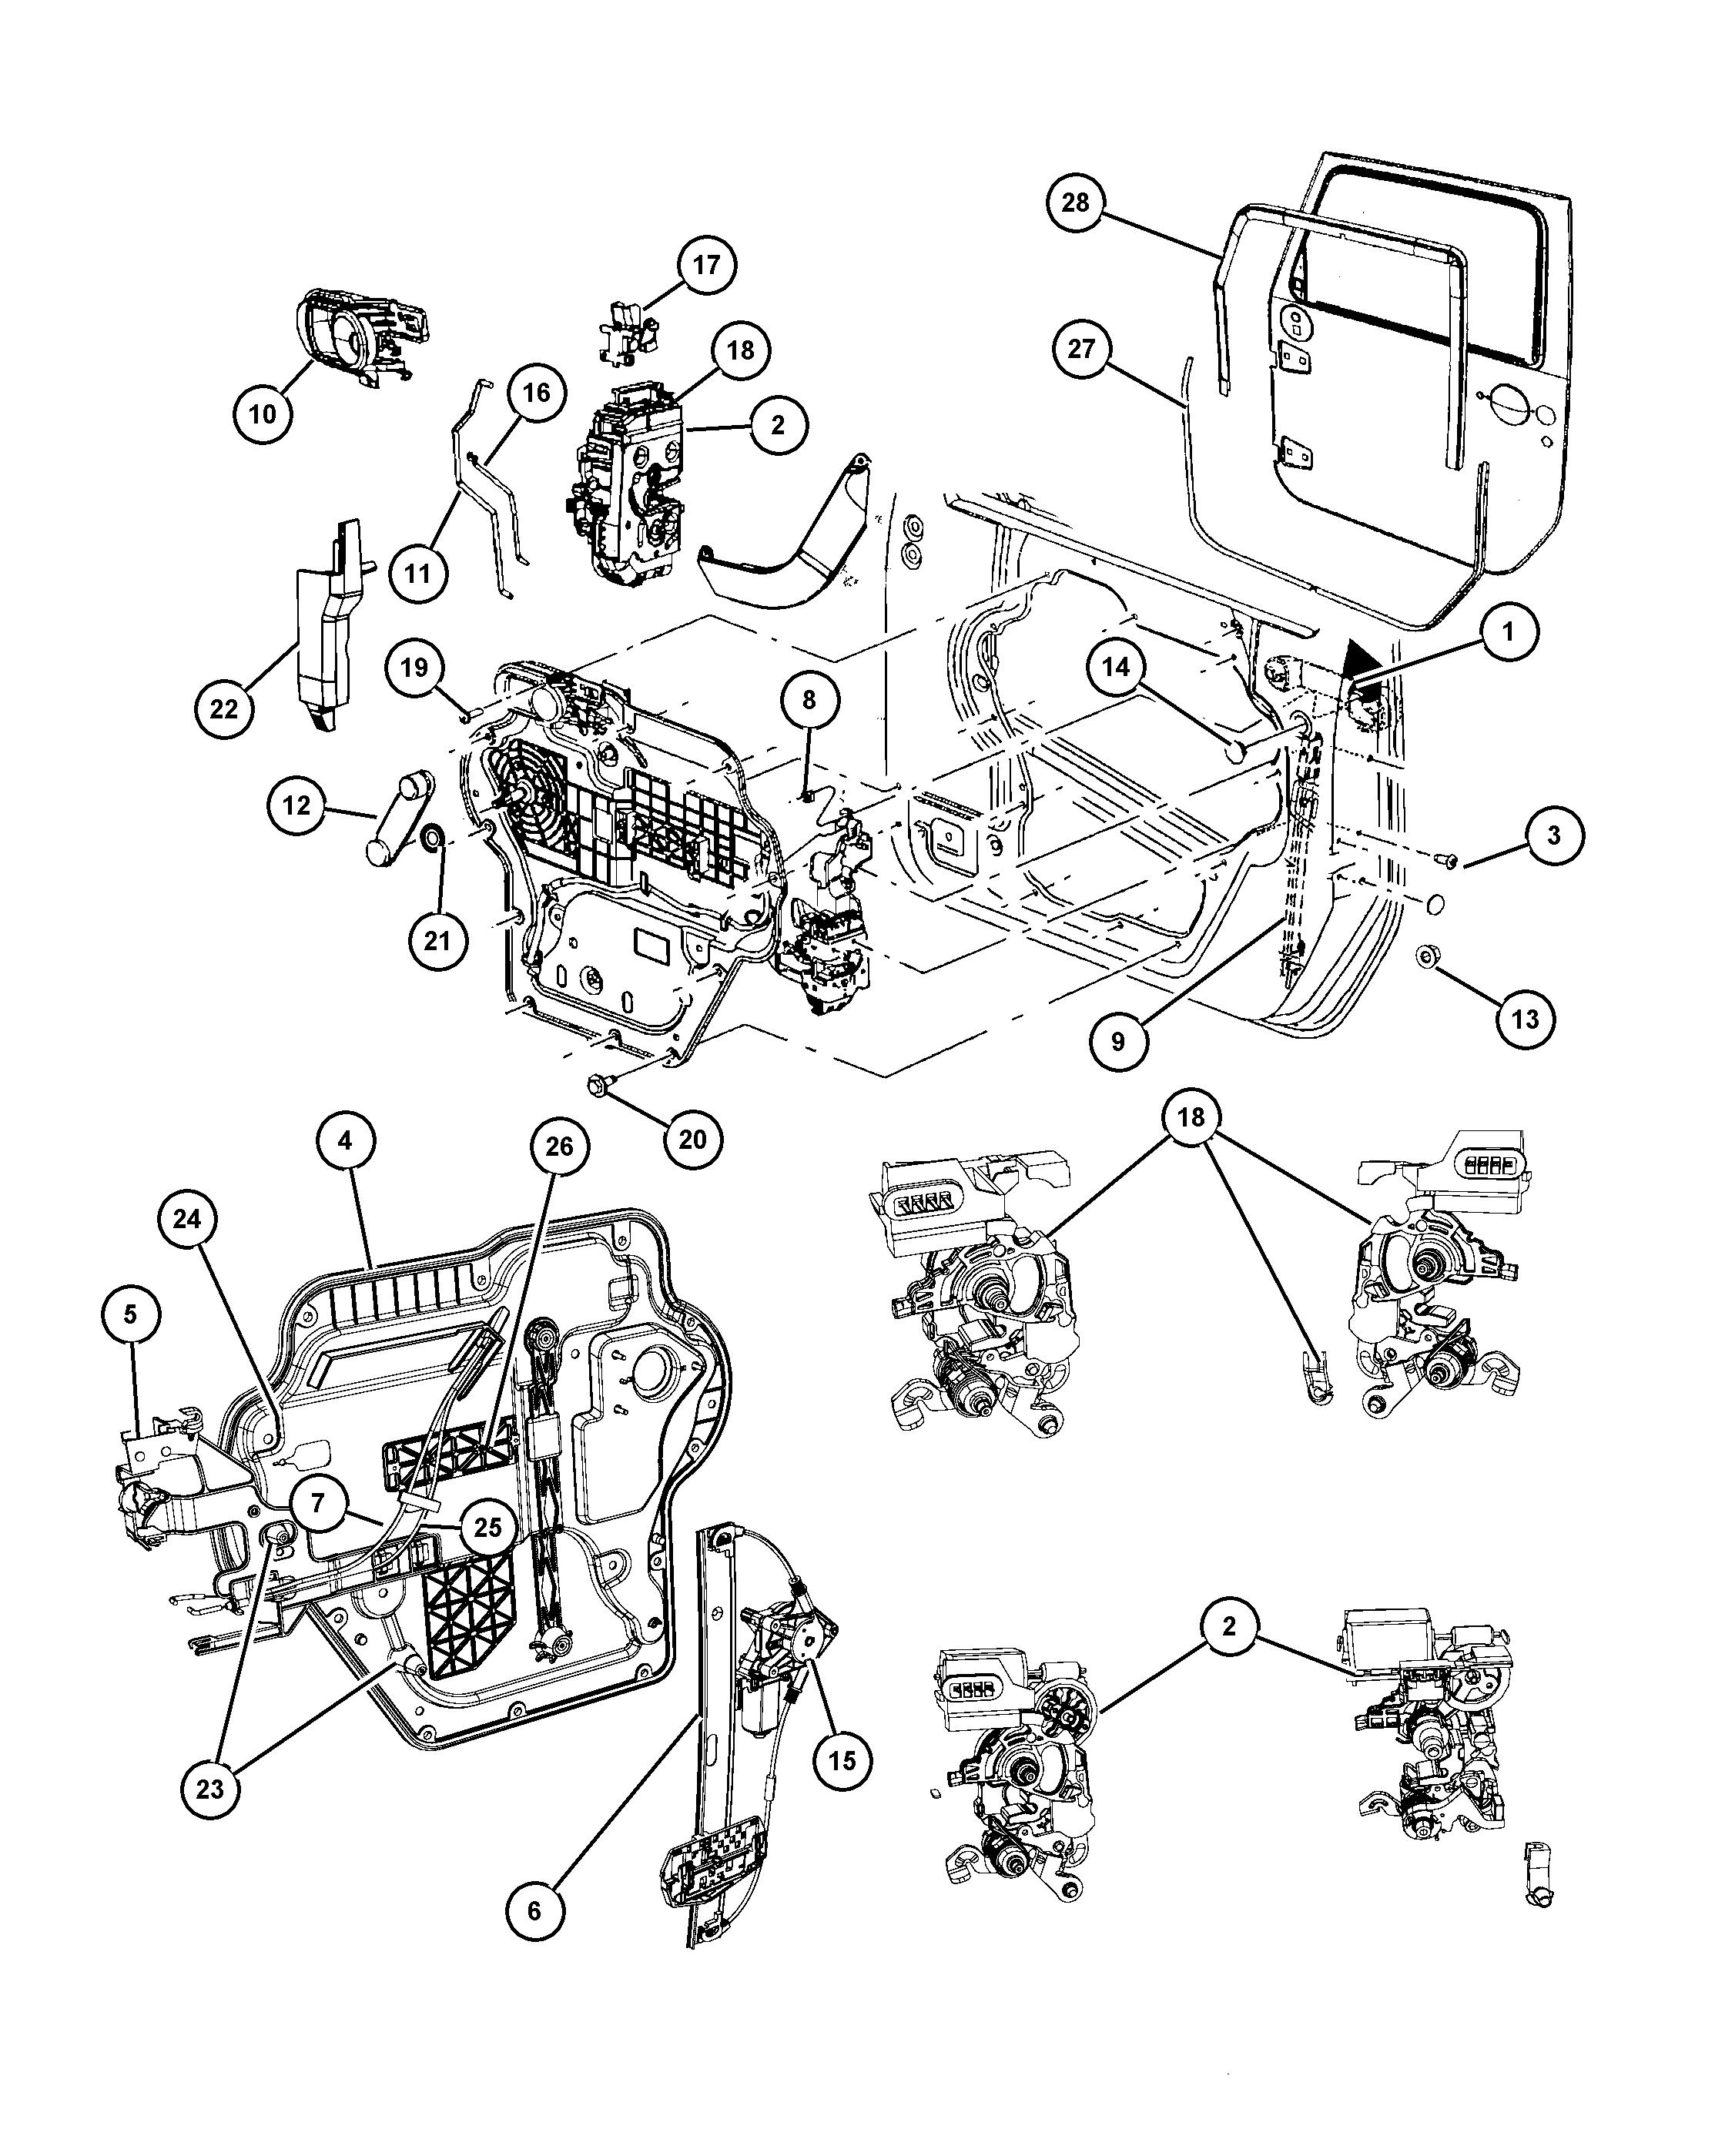 Chrysler Engine Parts Diagram Engine Car Parts And Component Diagram